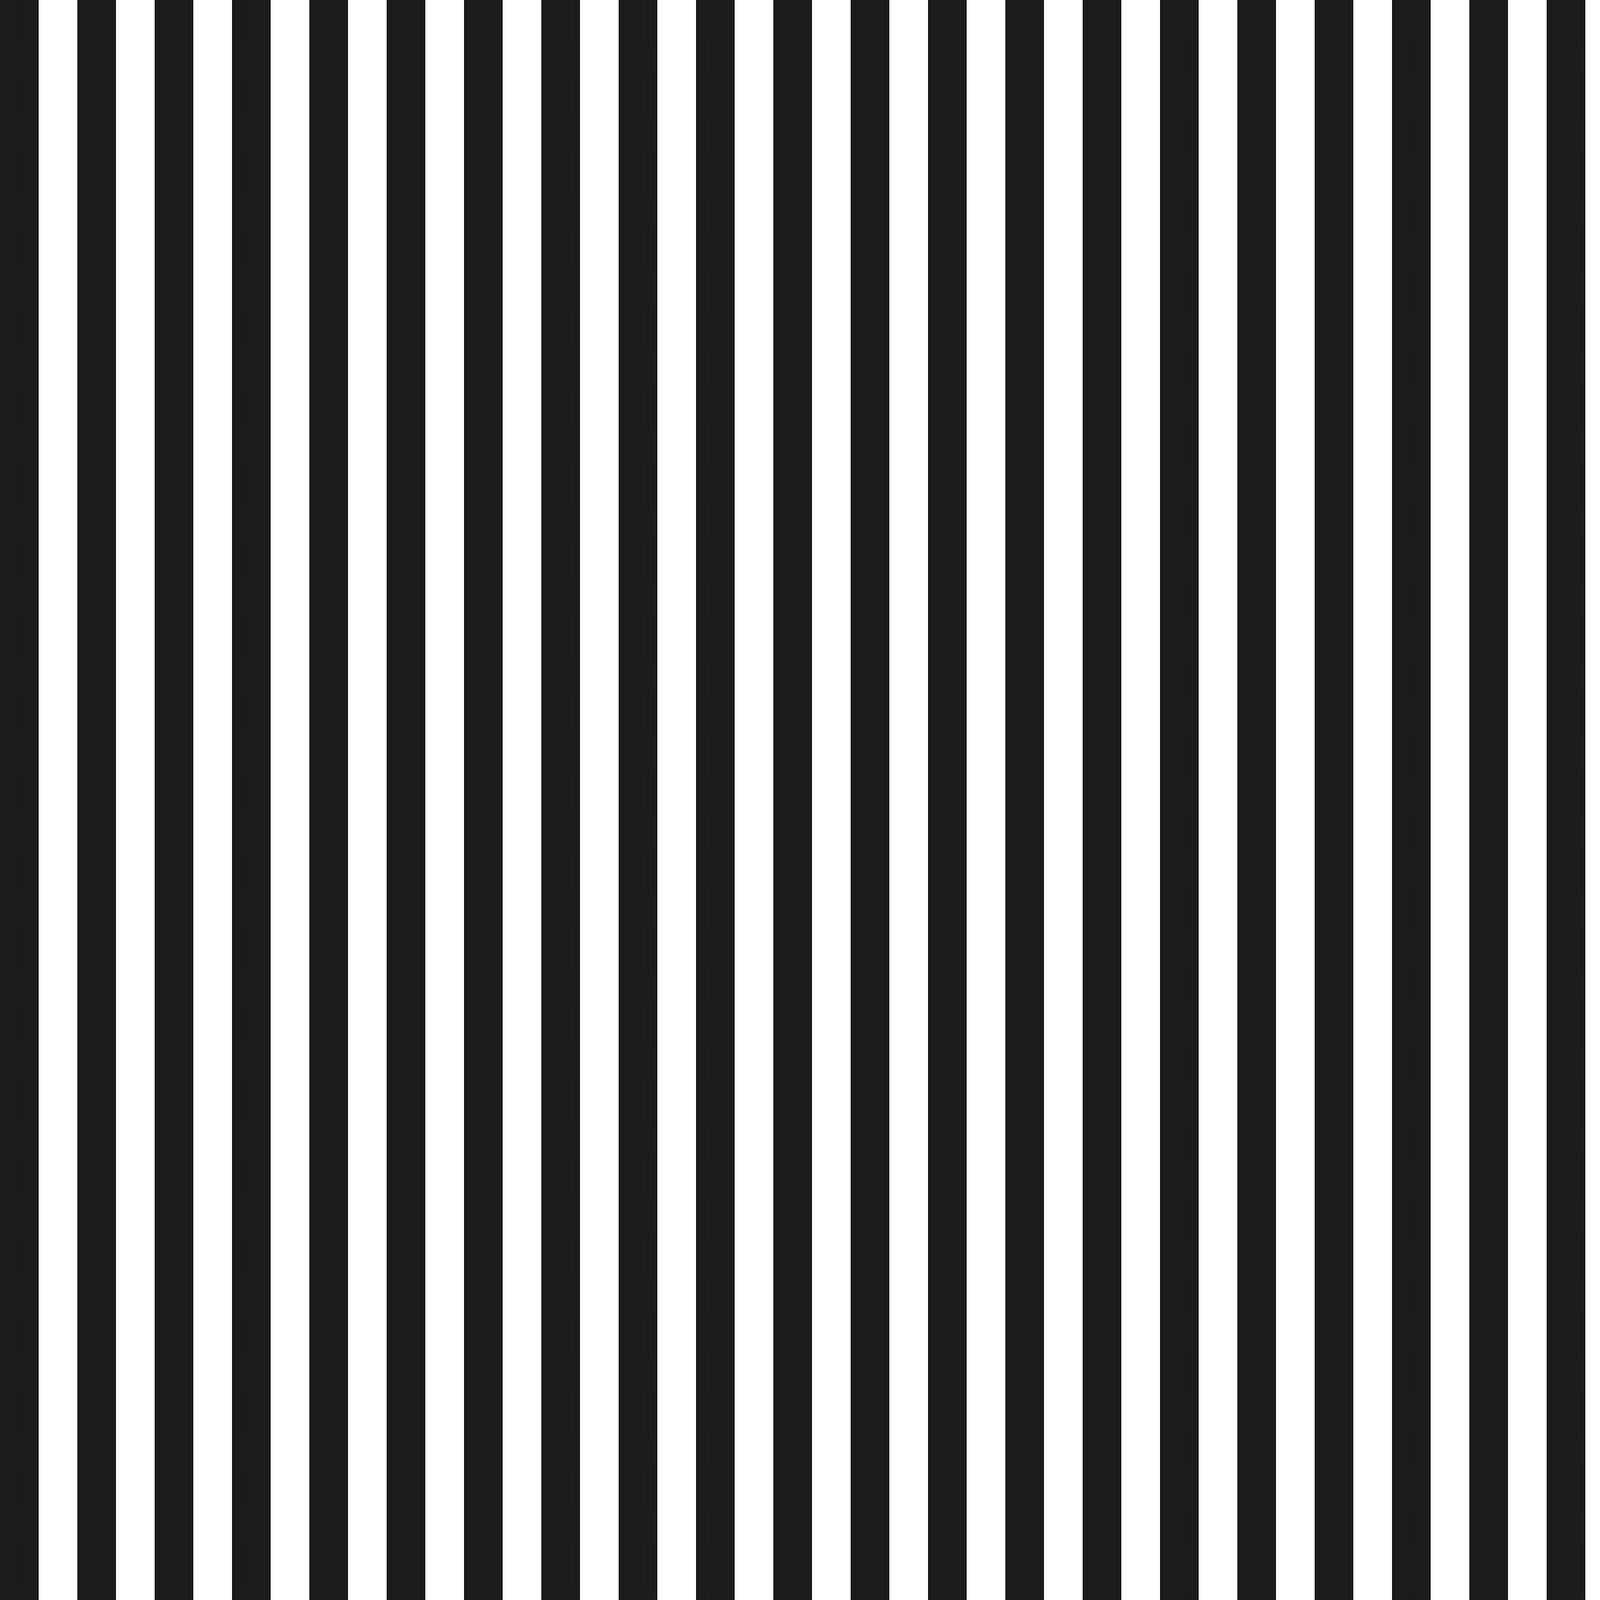 FREE ViNTaGE DiGiTaL STaMPS**: Free Digital Scrapbook Paper - Black ...